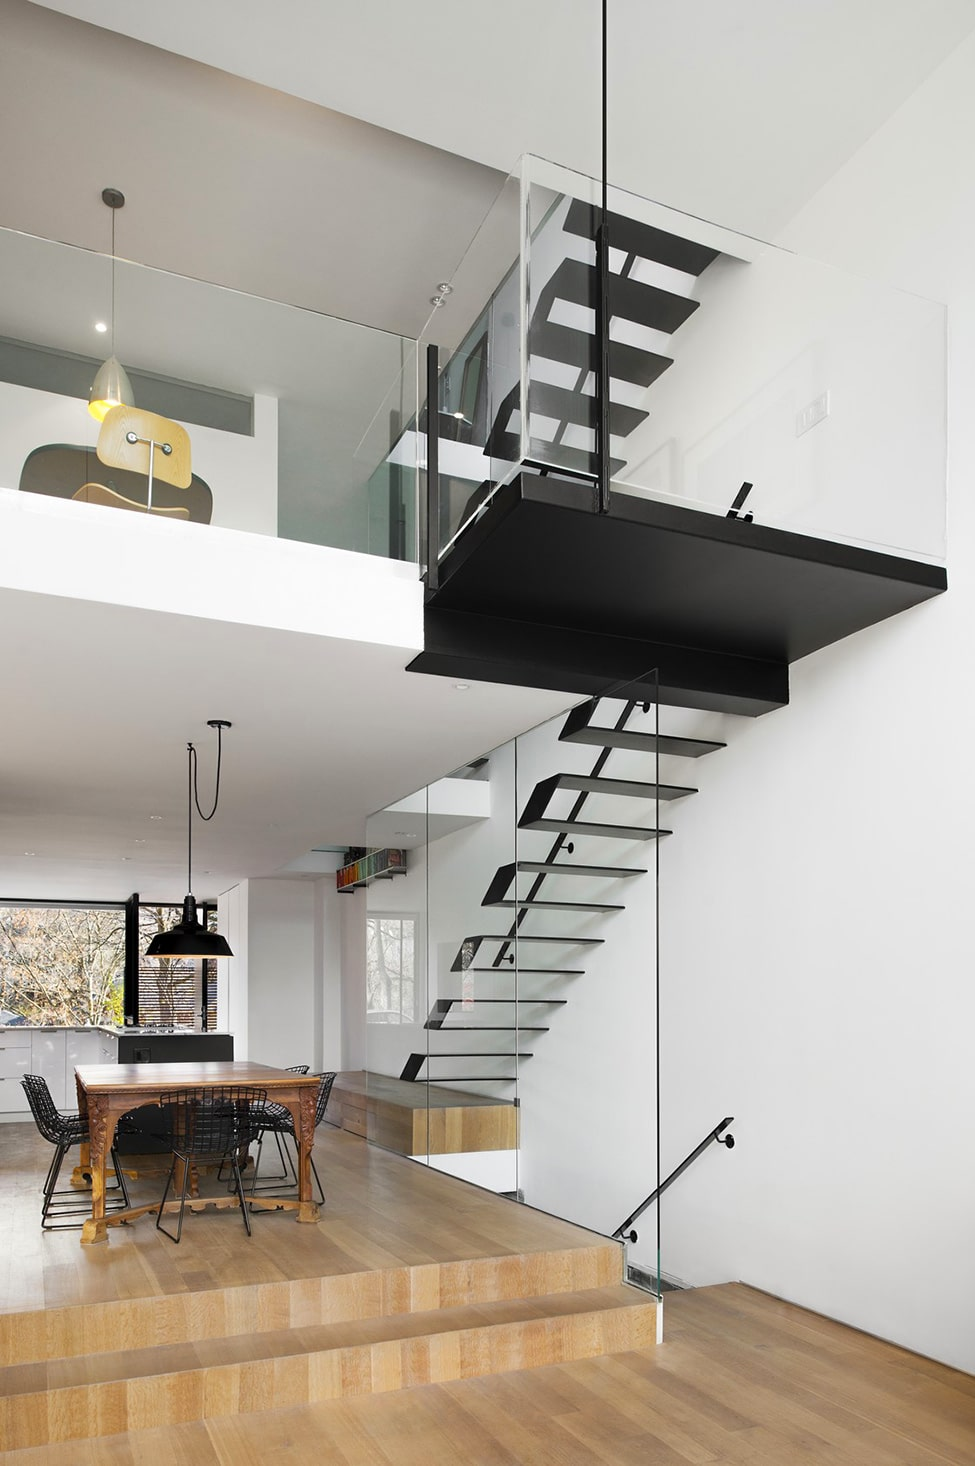 Planos de casa angosta y larga for Escaleras metalicas planos